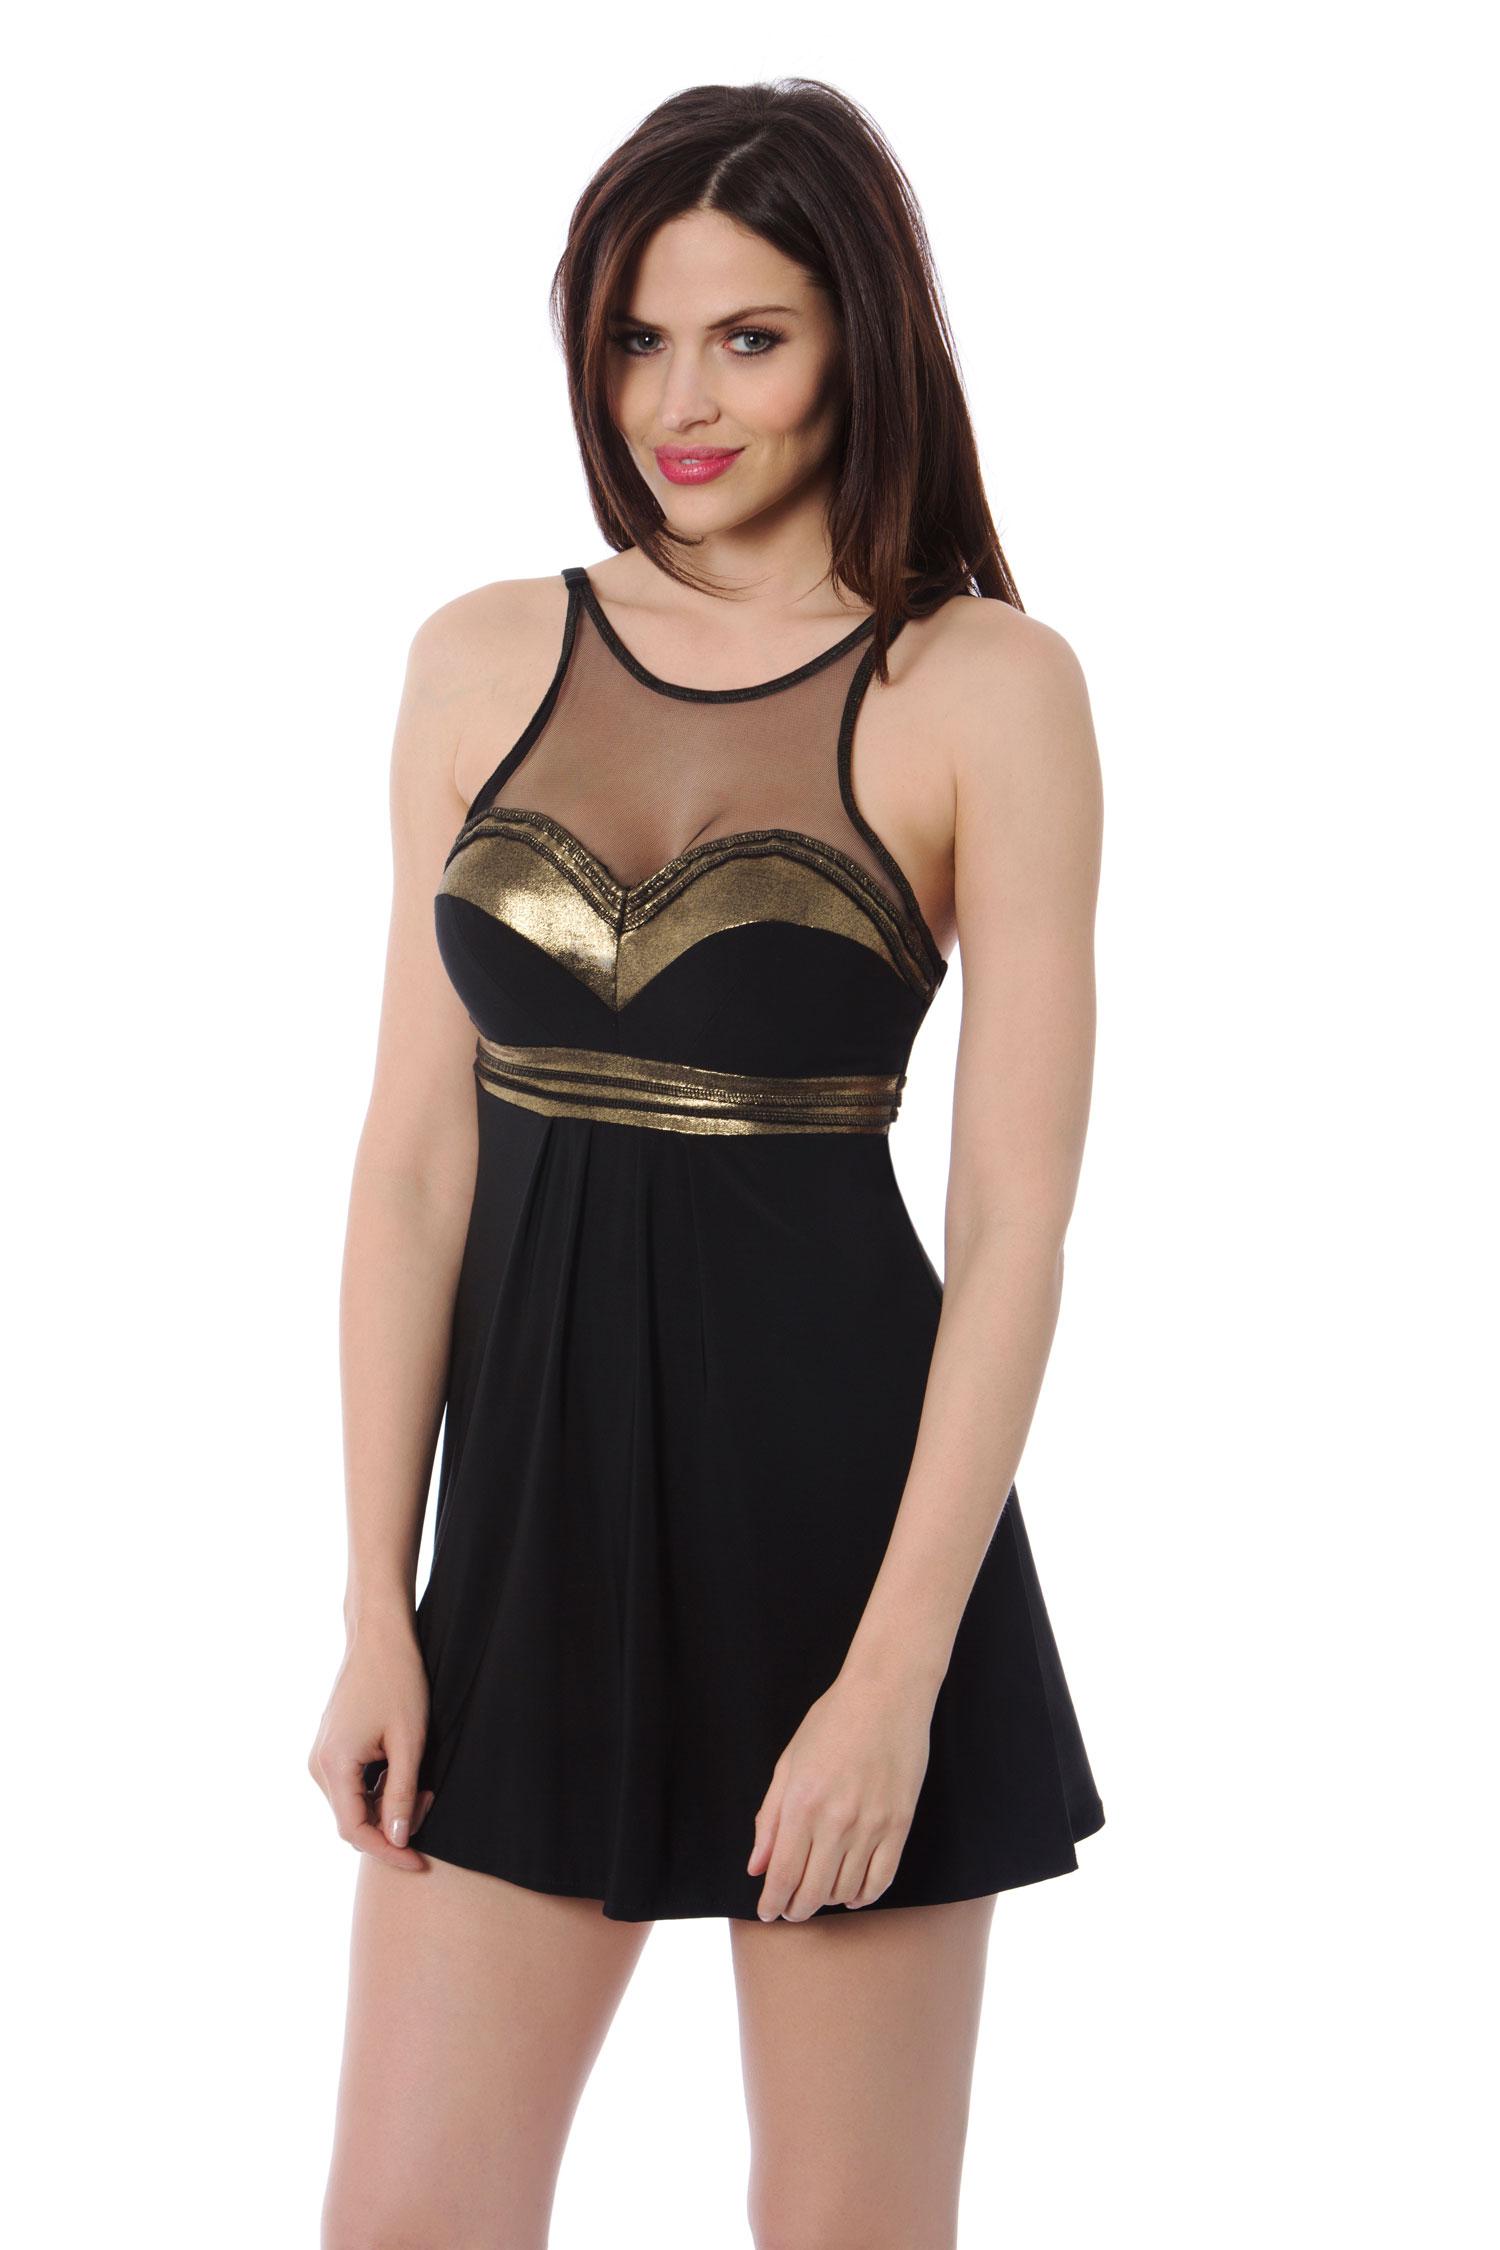 Z-Form-Uniform-Kelsy-Zimba-Dress-CD8.jpg